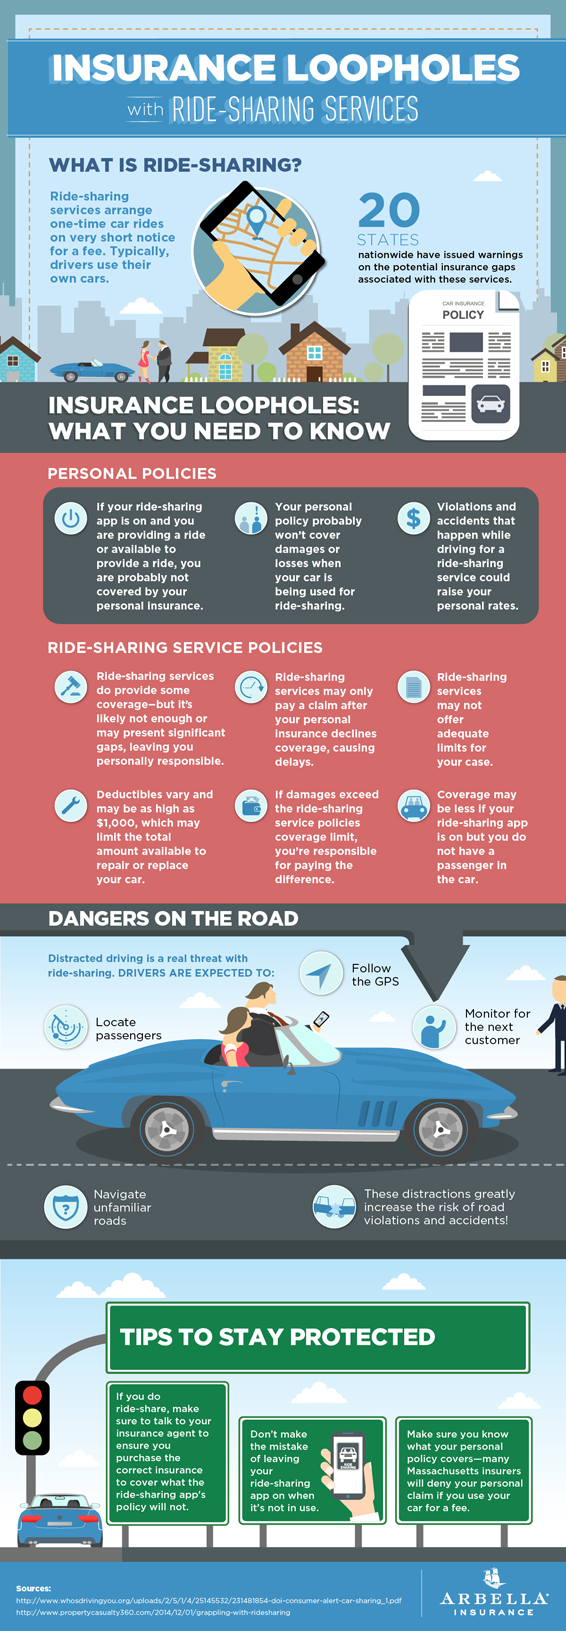 Arbella S Ride Sharing Infographic Con Imagenes